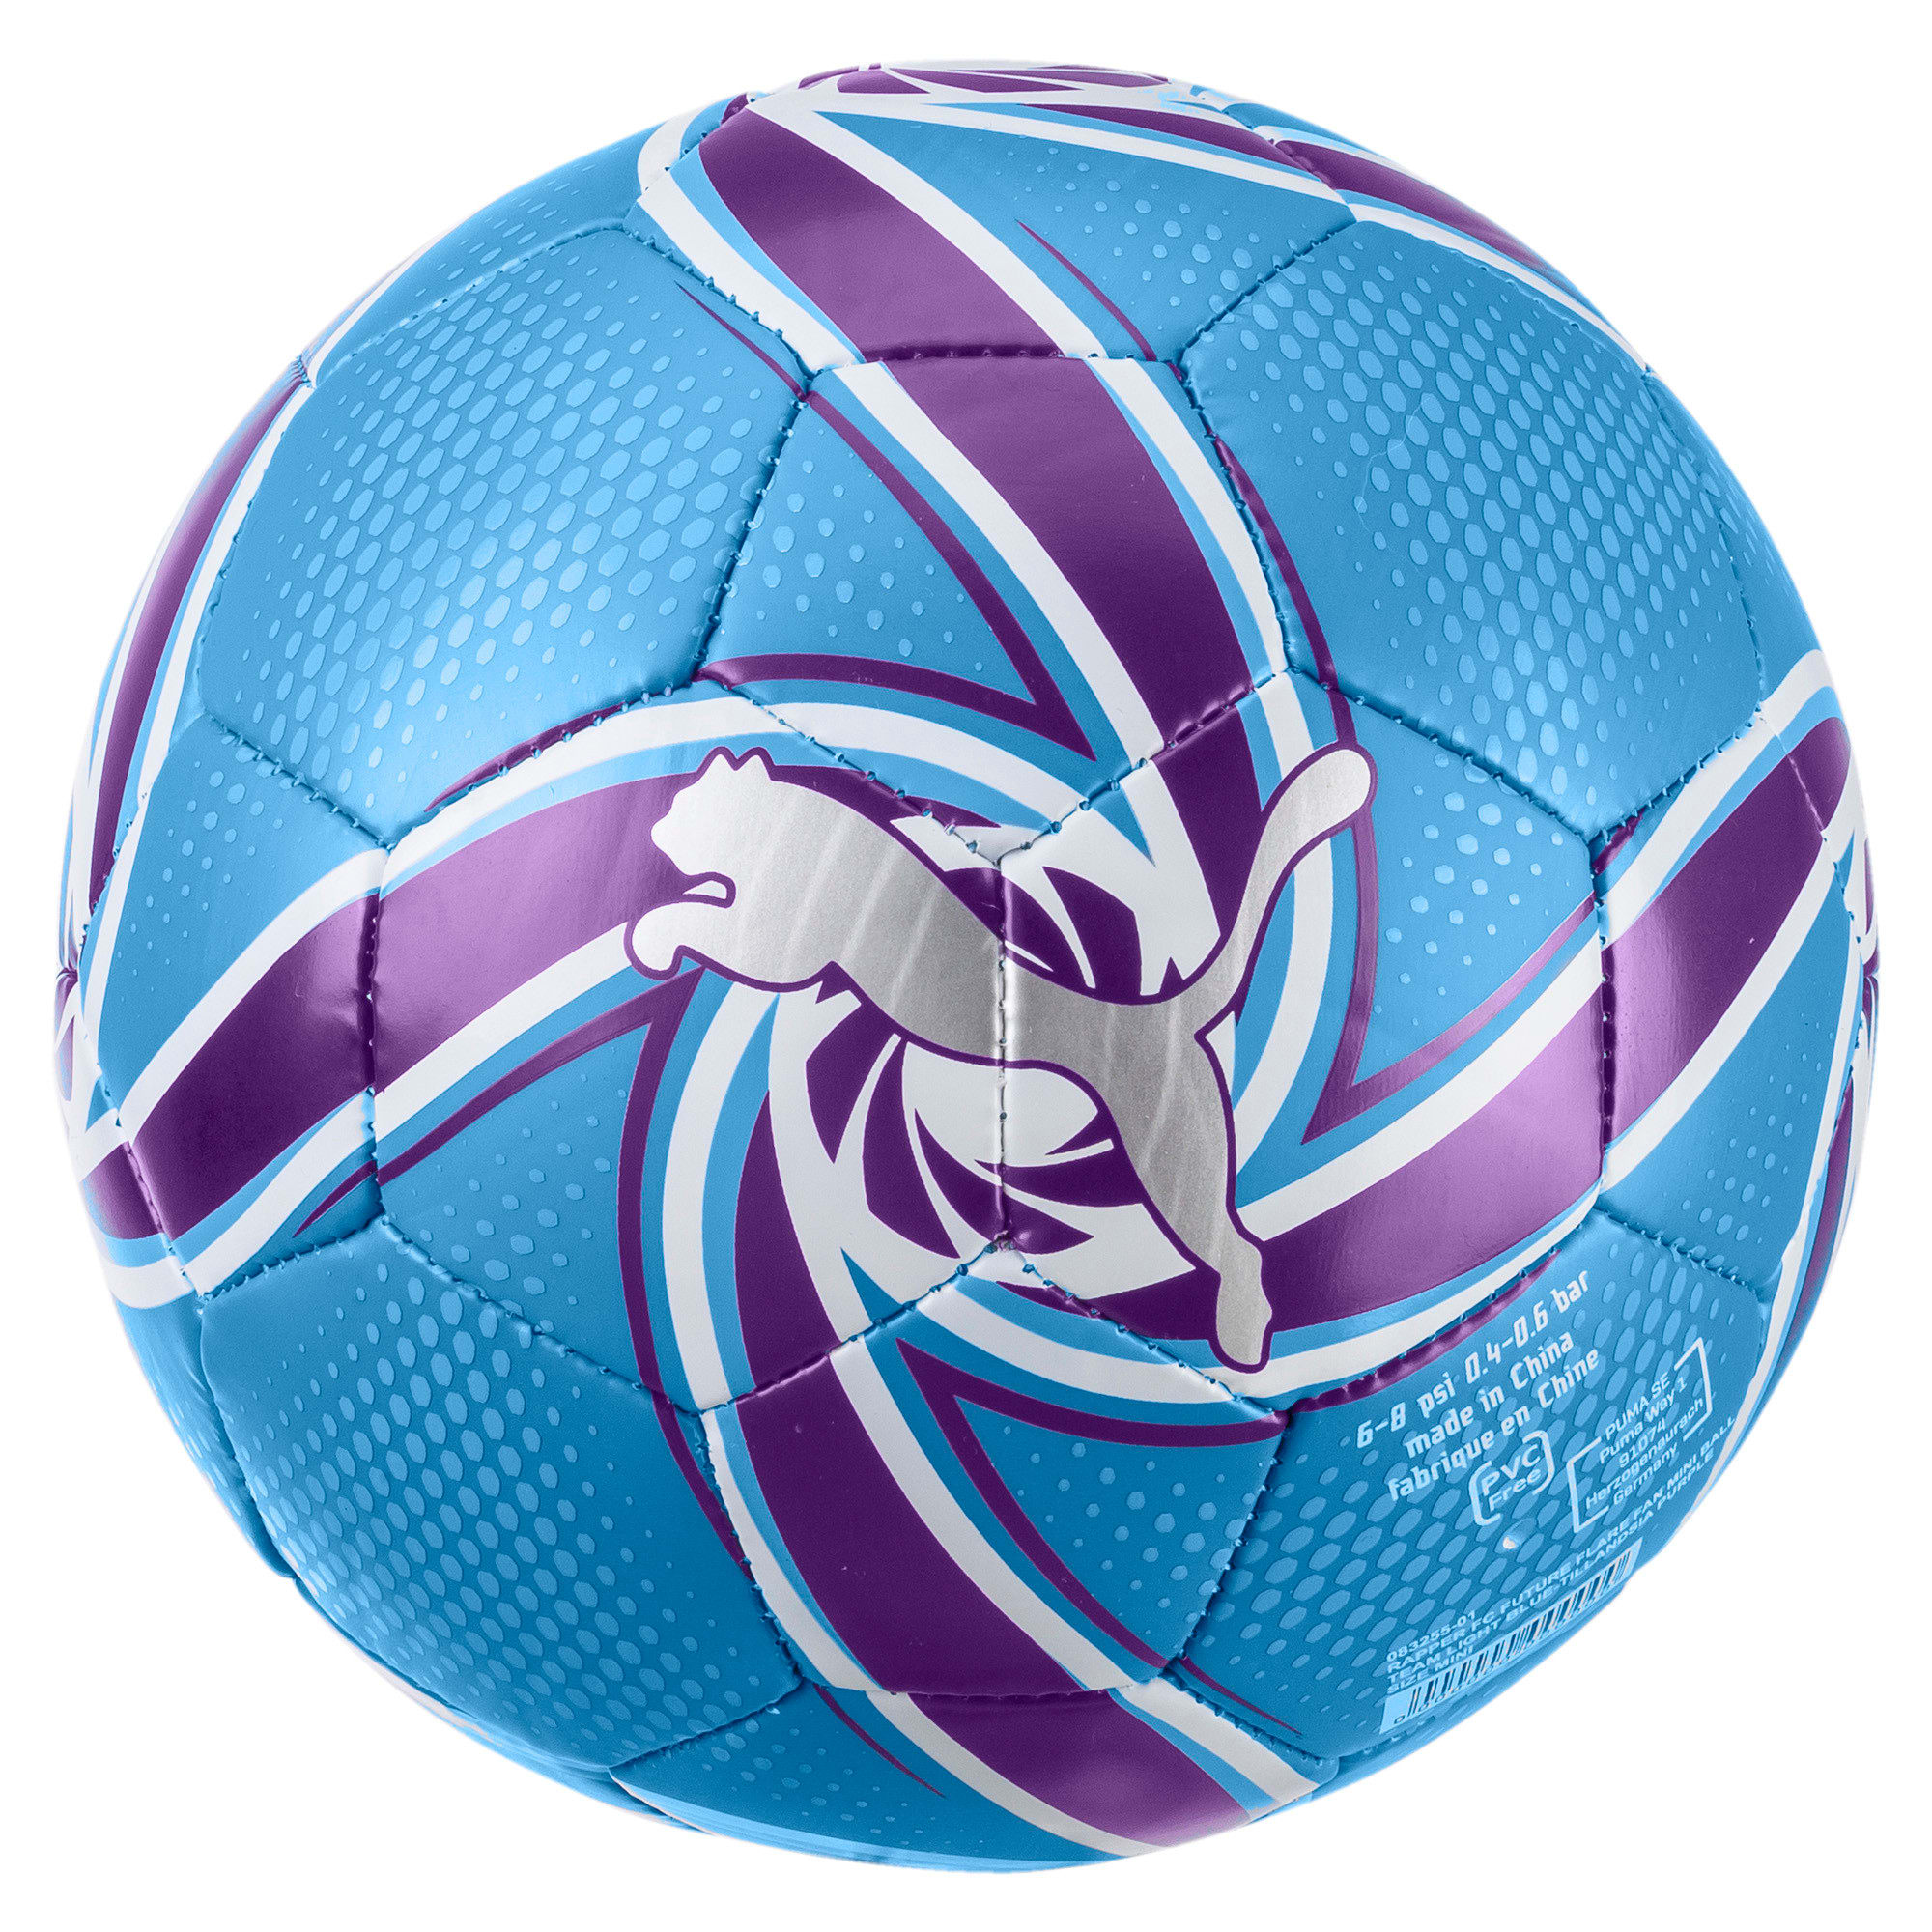 Thumbnail 1 of Mini ballon Manchester City FUTURE Flare, Team Light Blue-Tillandsia, medium